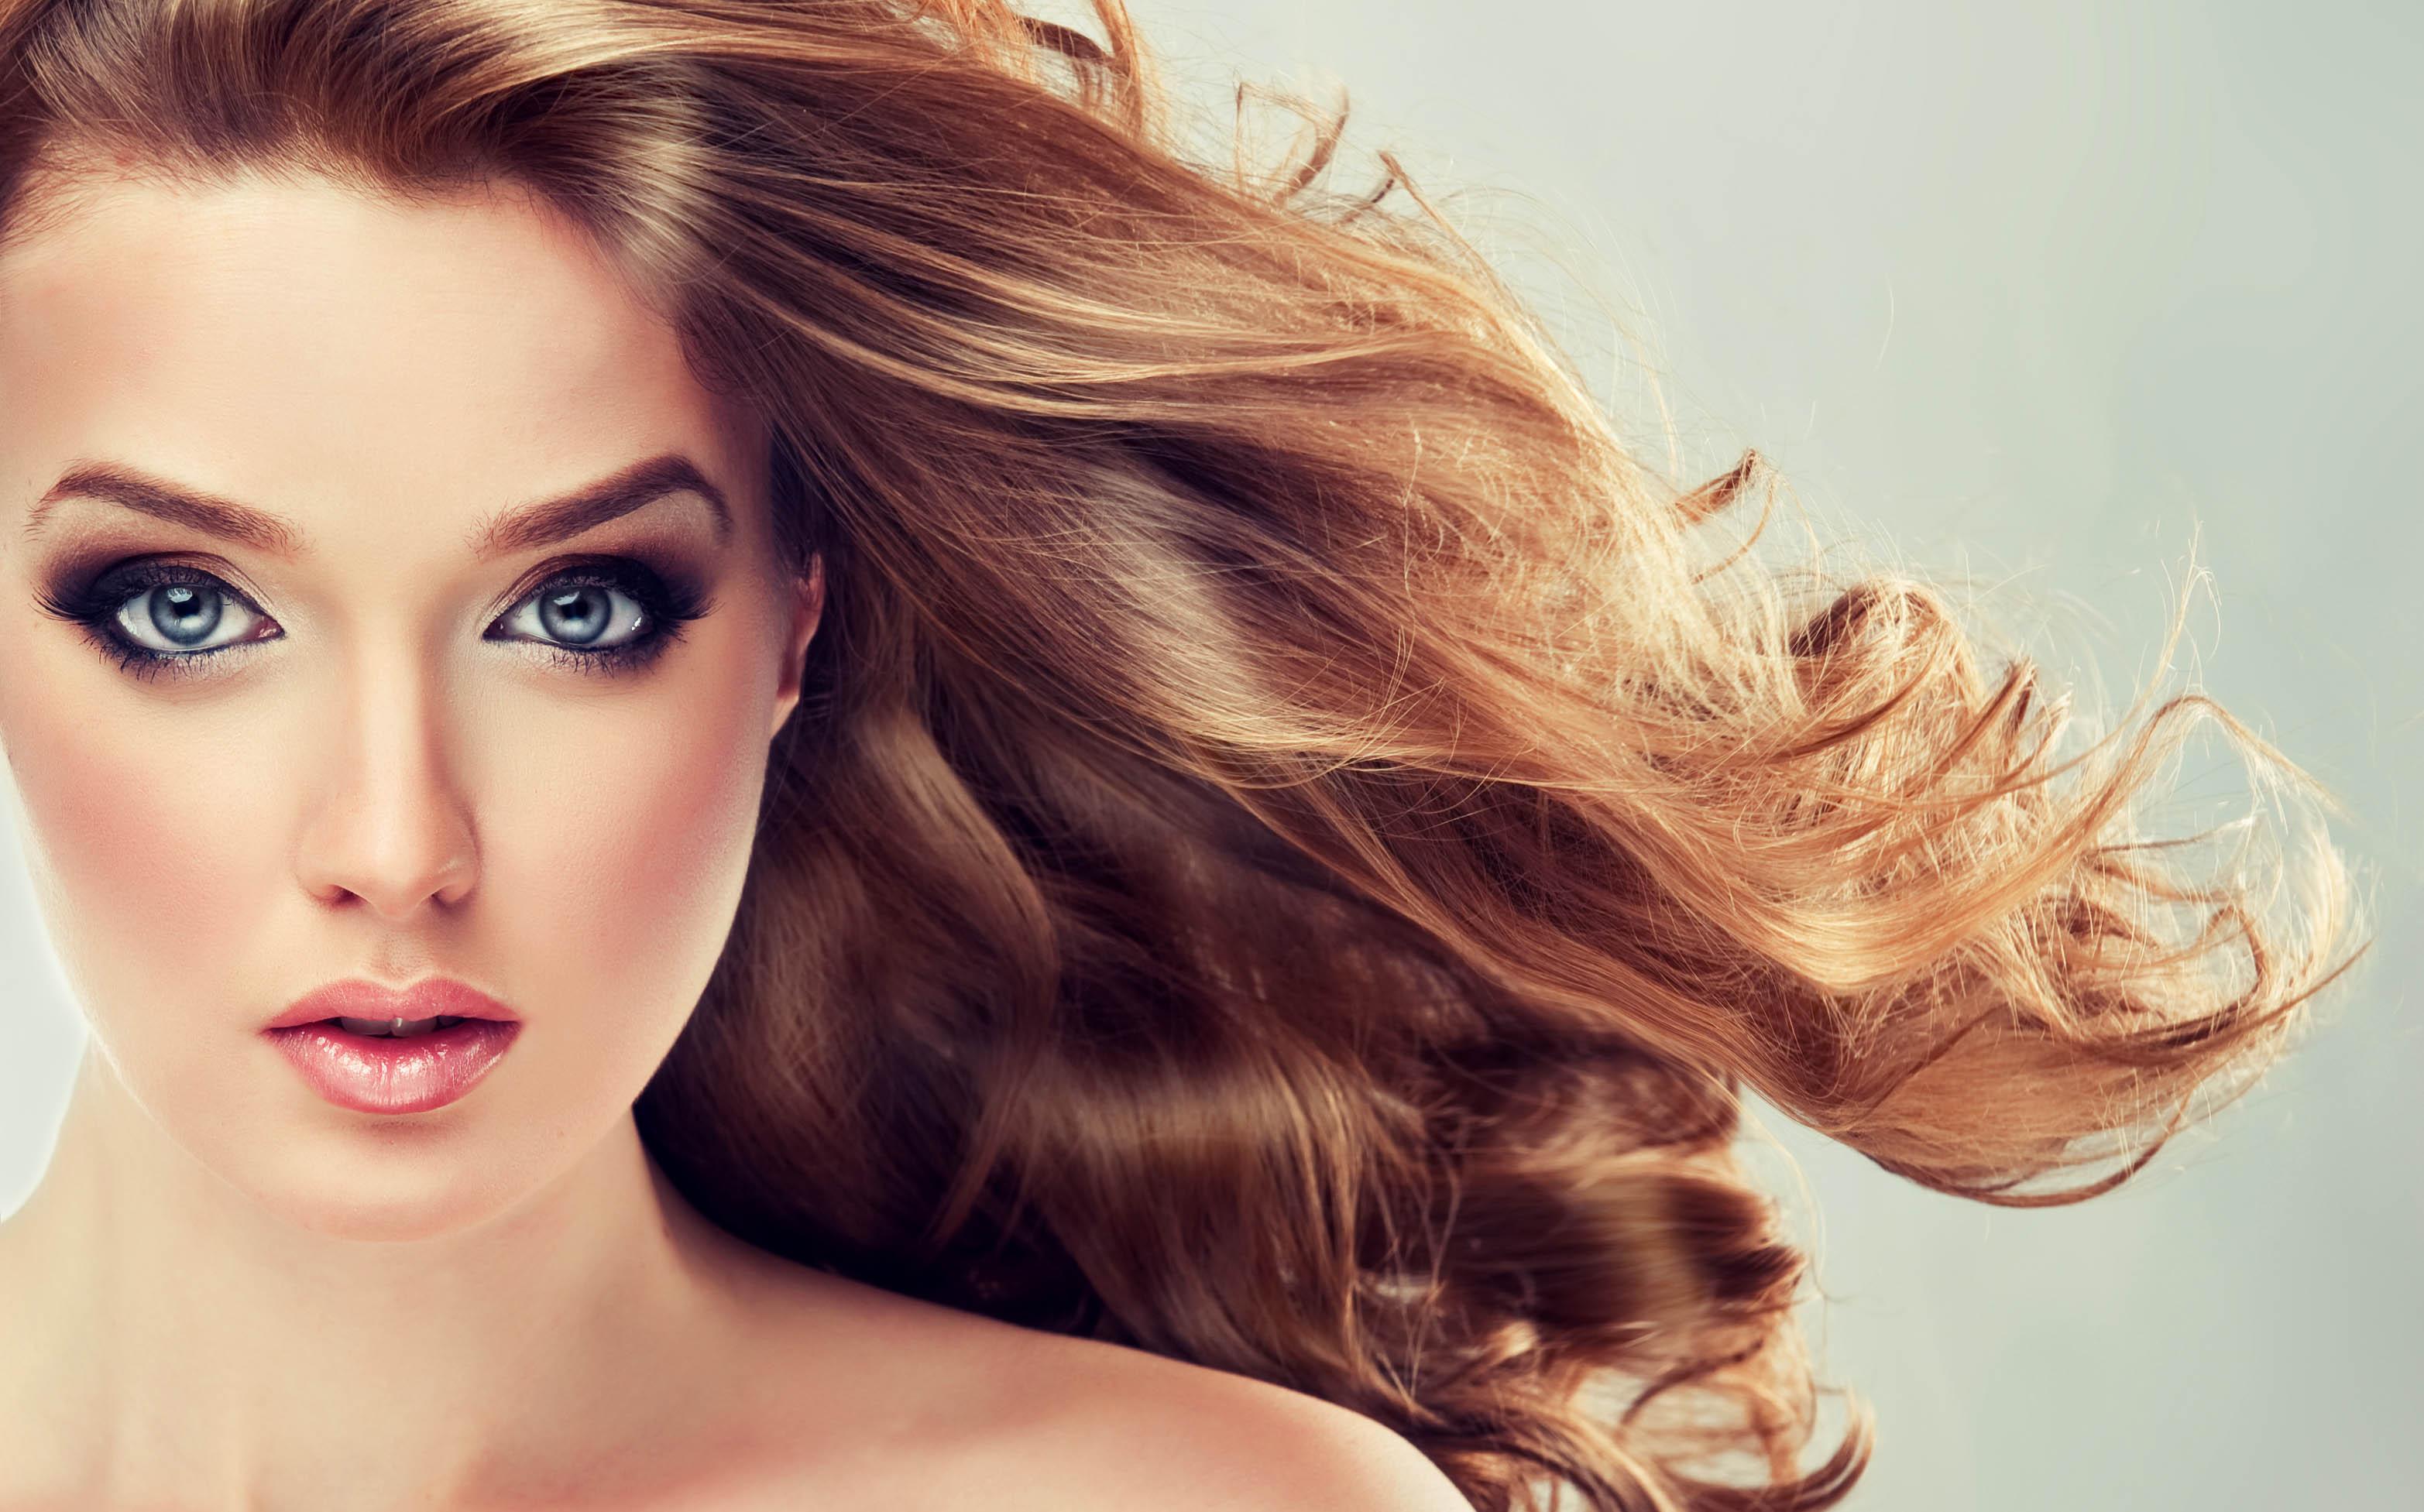 capelli-lunghi-zephir-parrucchieri-ascona-muralto